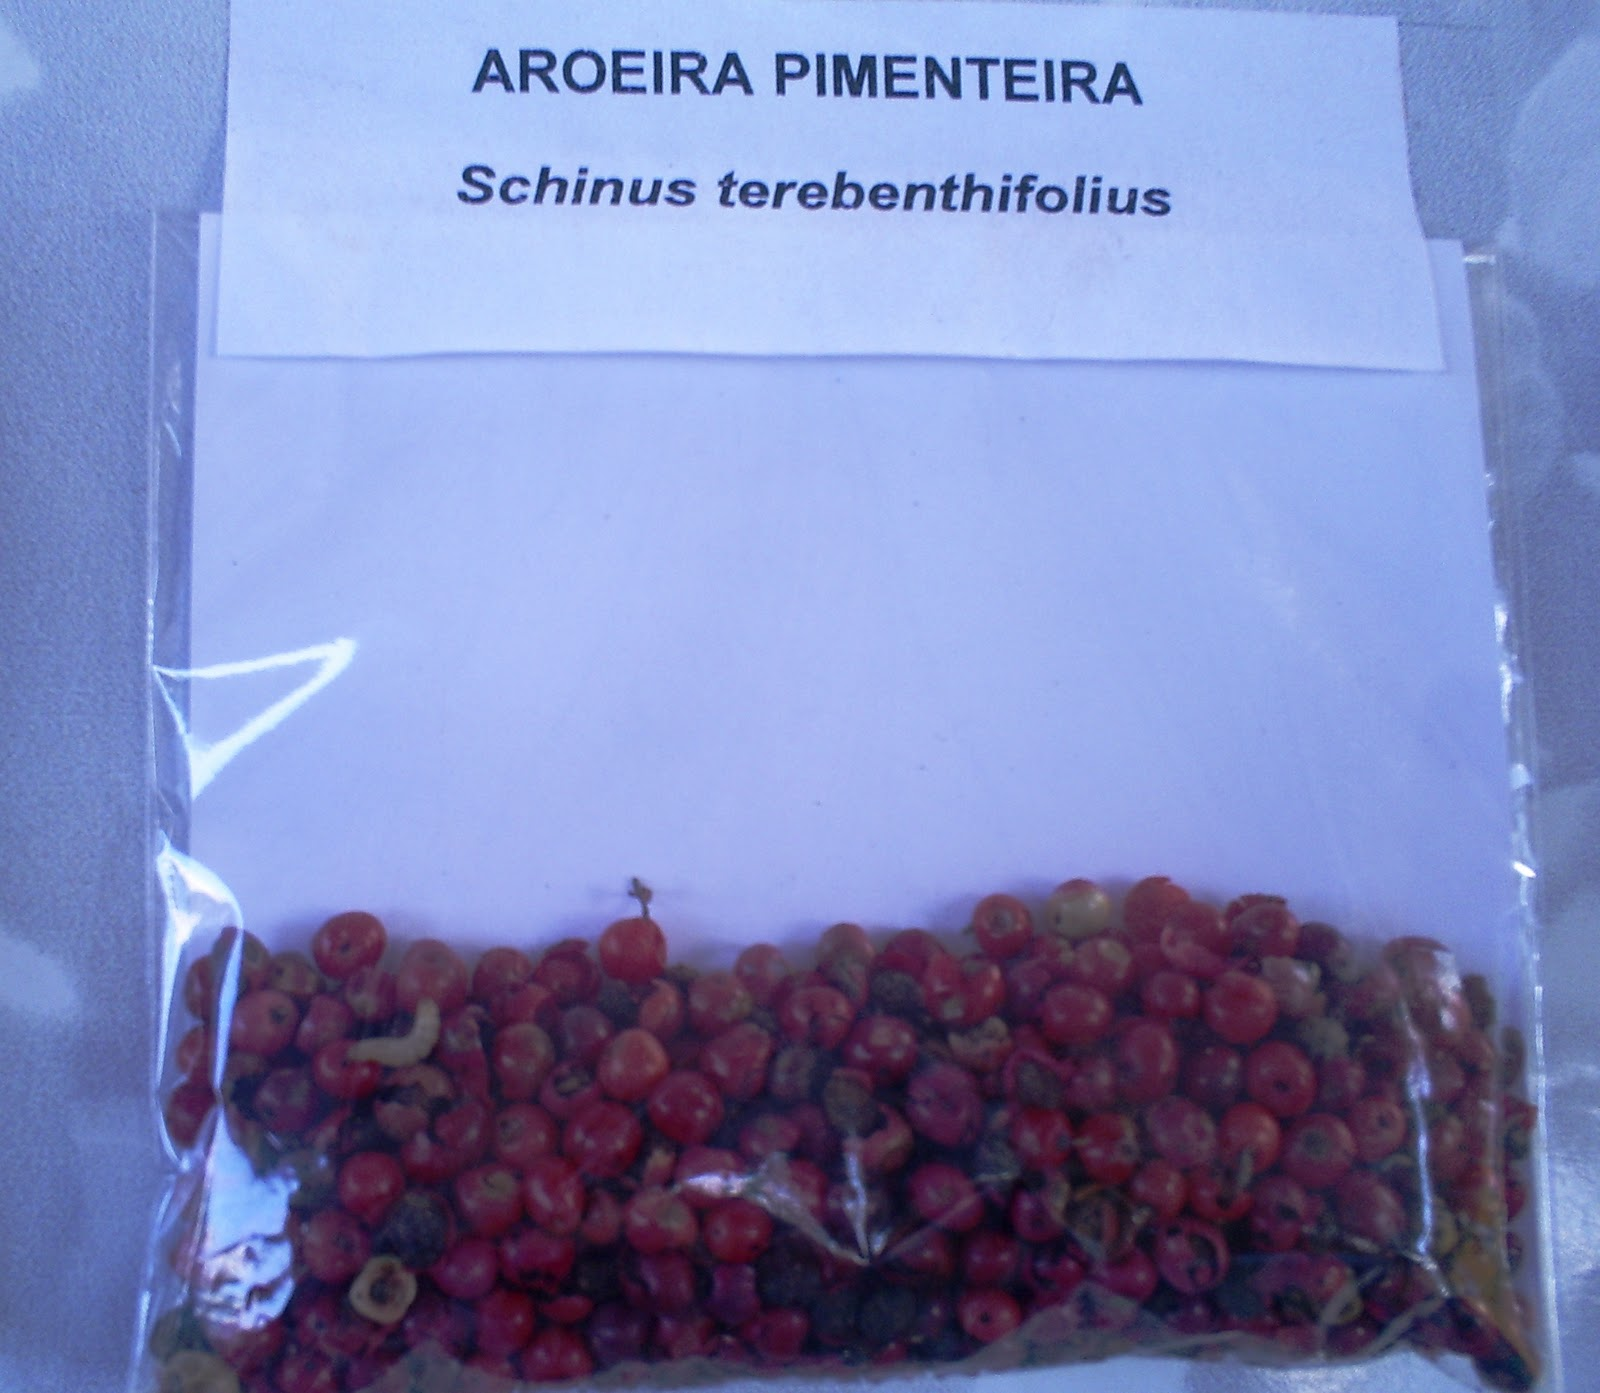 Projeto Usina: Aroeira Pimenteira #0C47BF 1600 1393